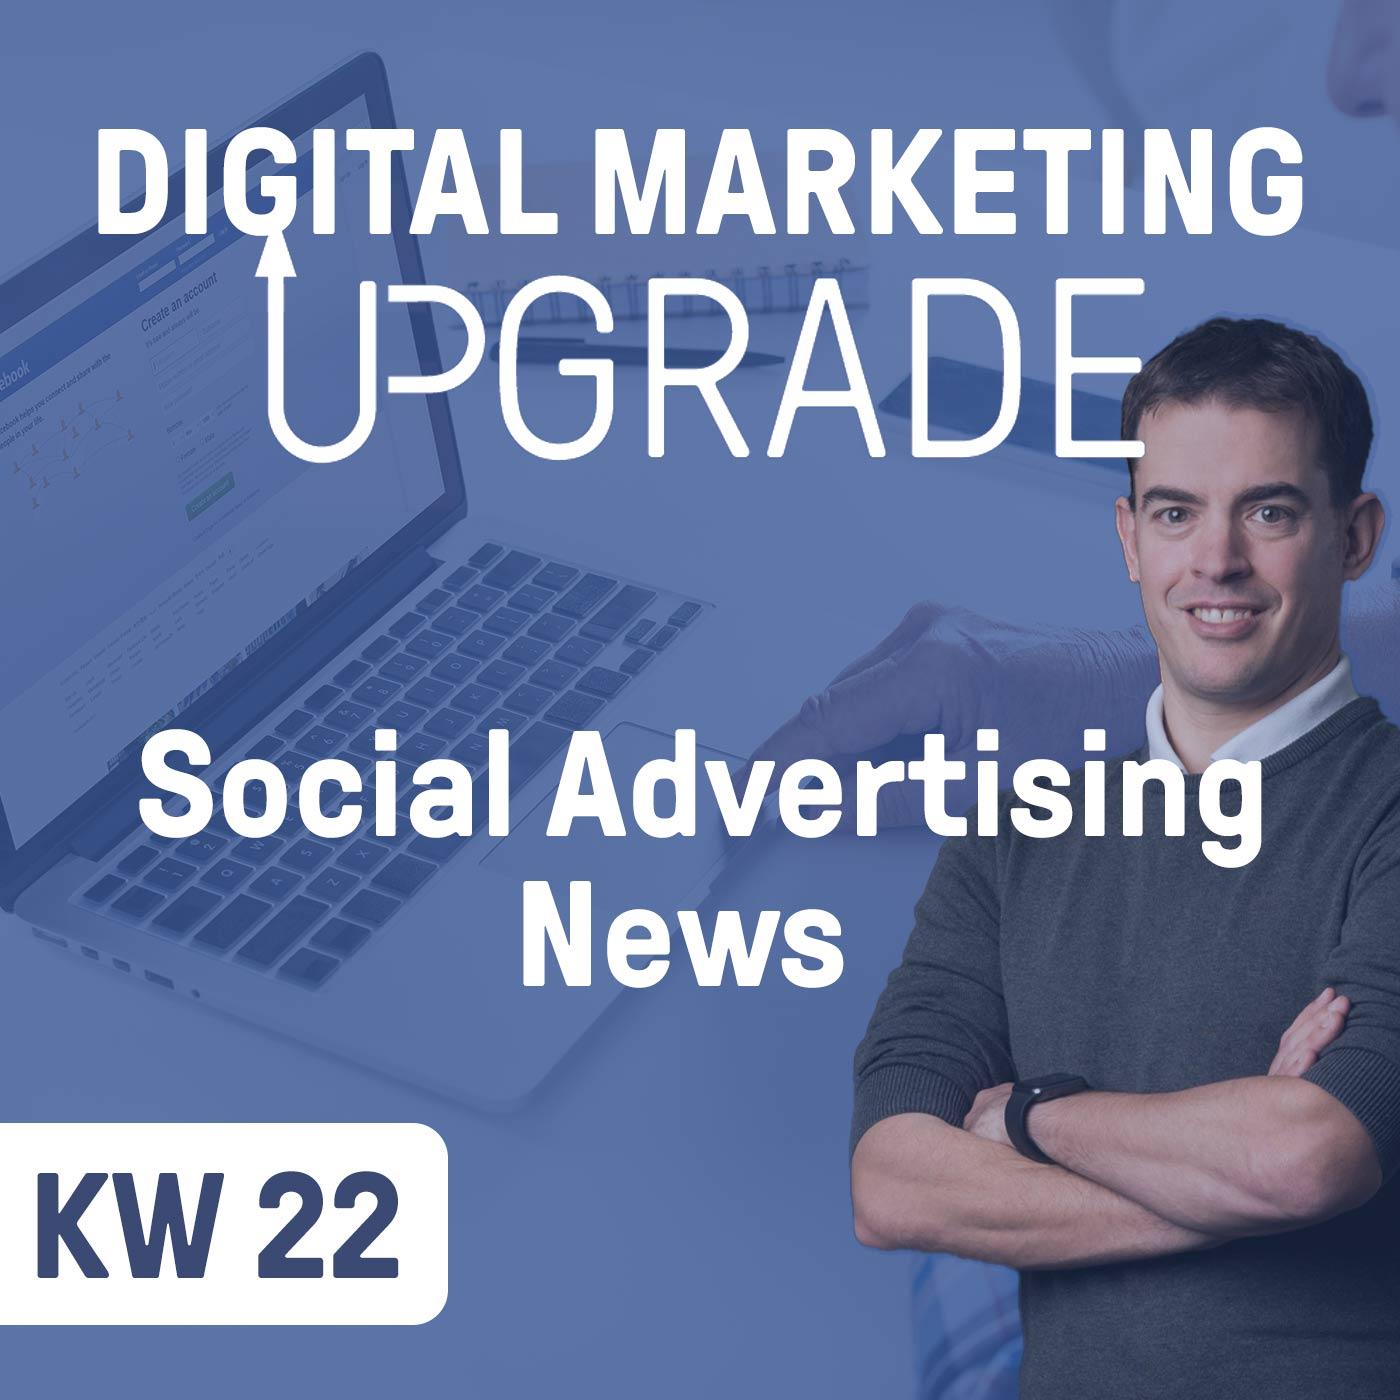 Social Advertising News - KW 22